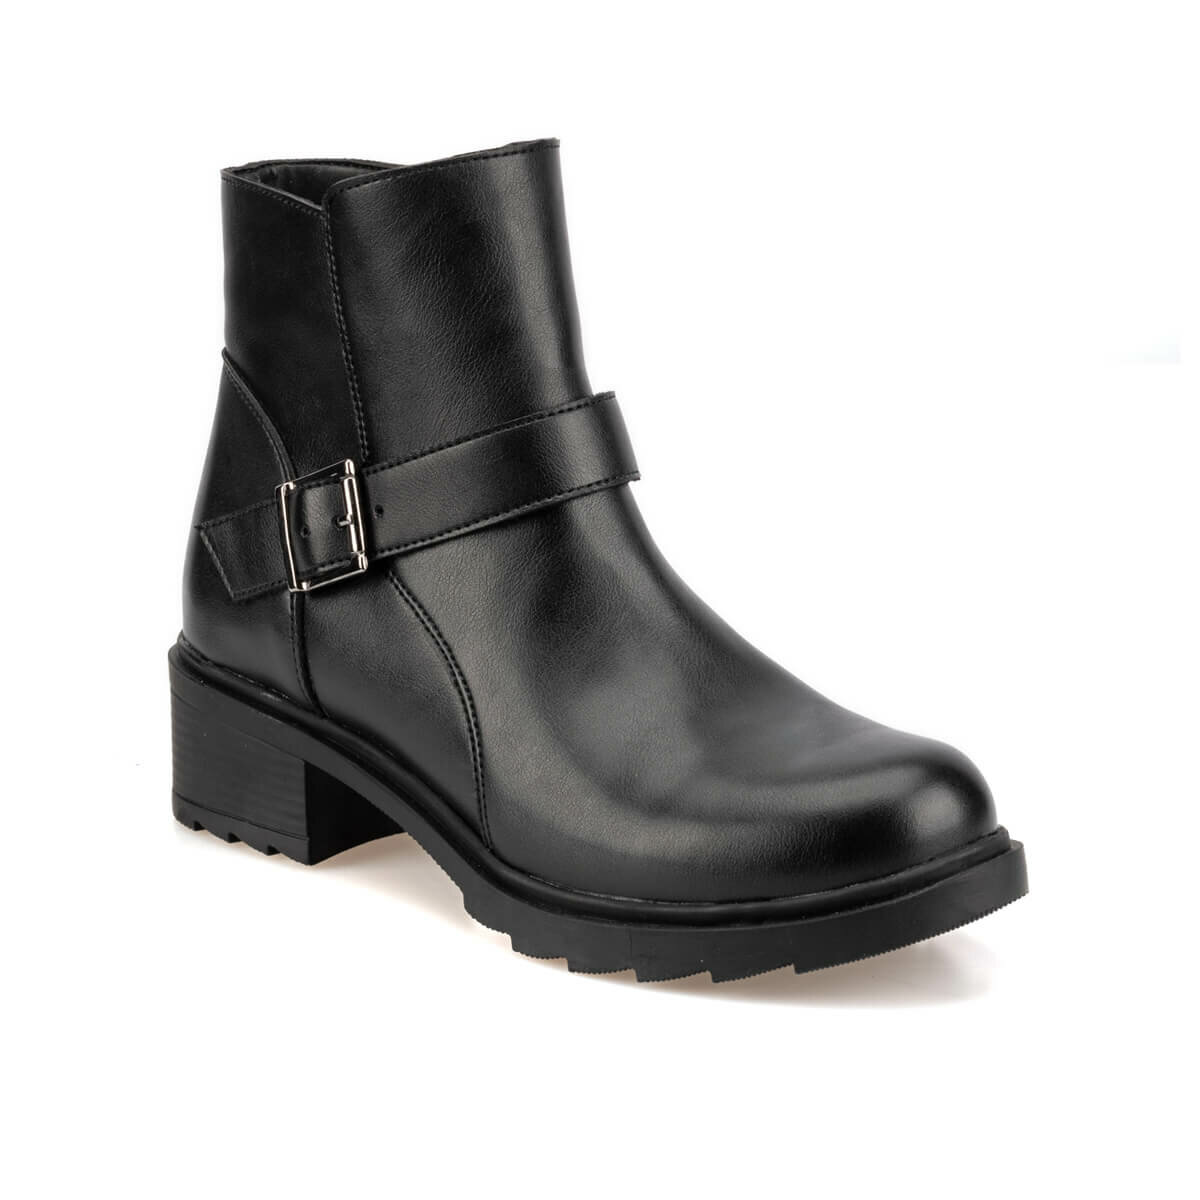 FLO 92.314713.Z Black Women Boots Polaris